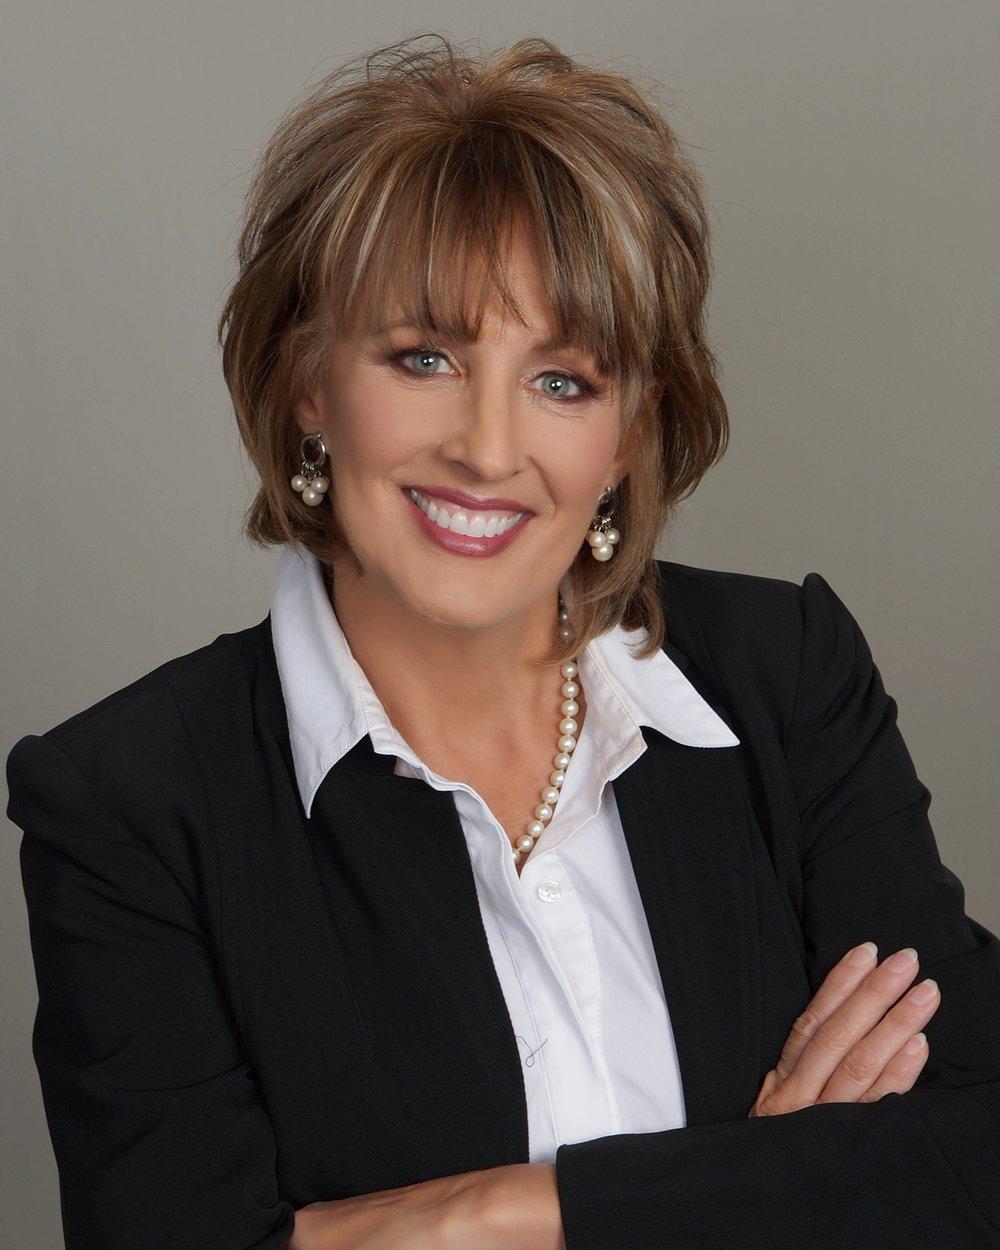 Tonya Romer, Professional Organizer